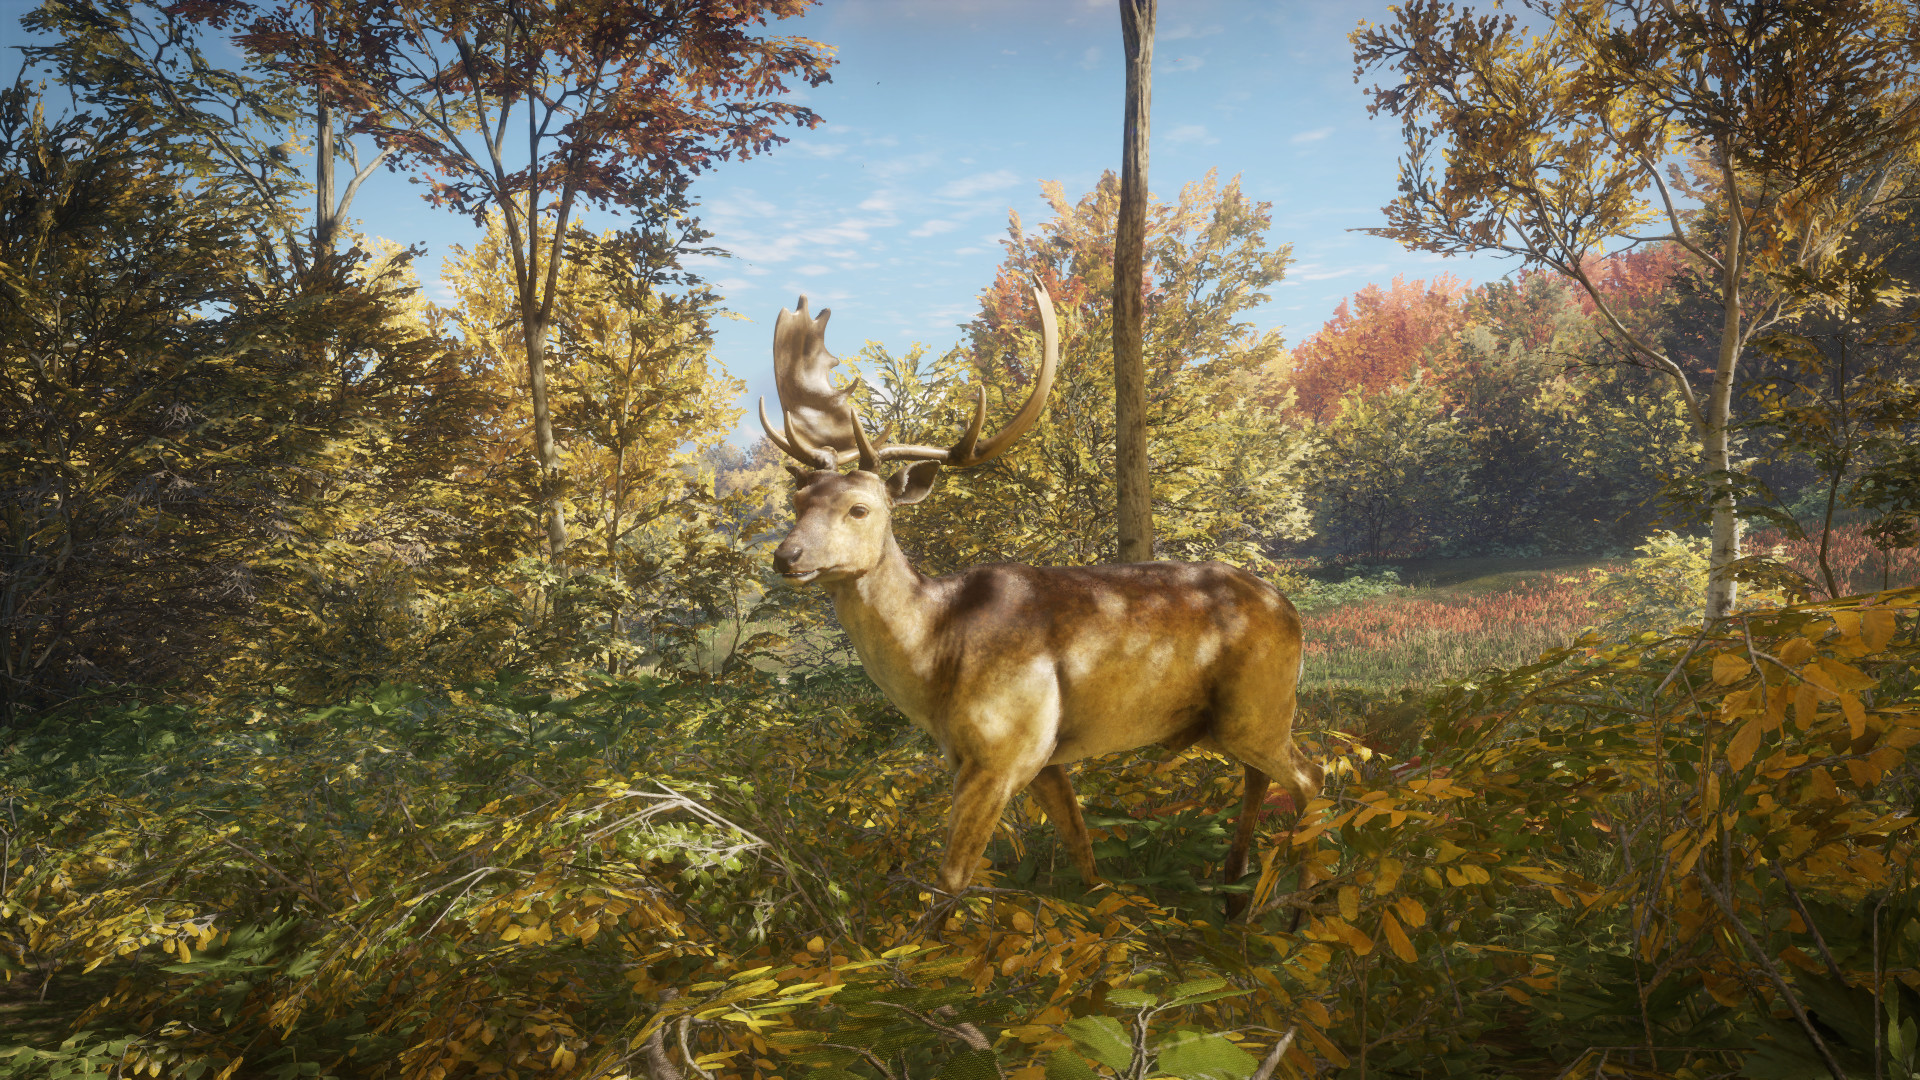 Yarrid henrard fallow deer foliage